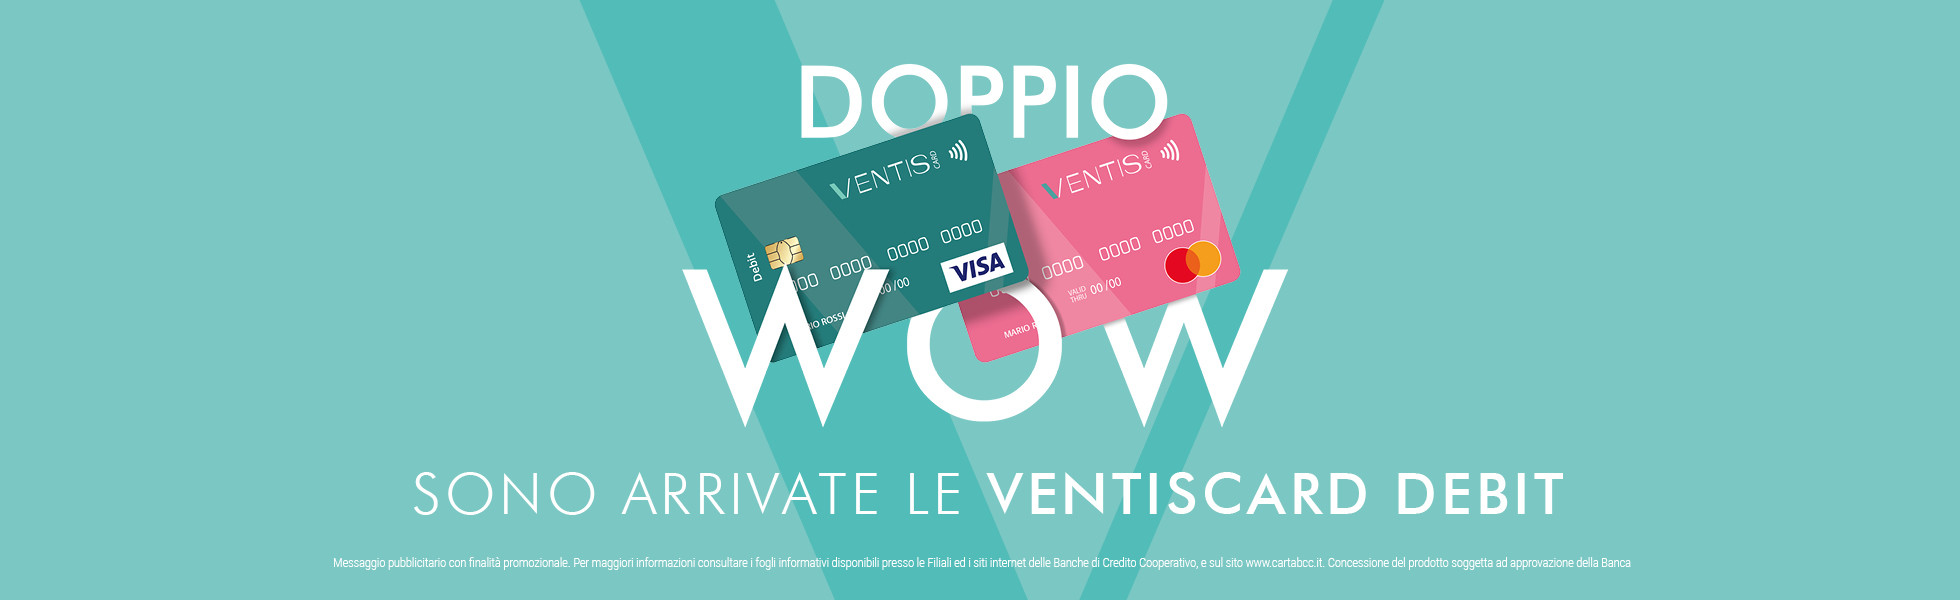 VentisCard Debit 800x532